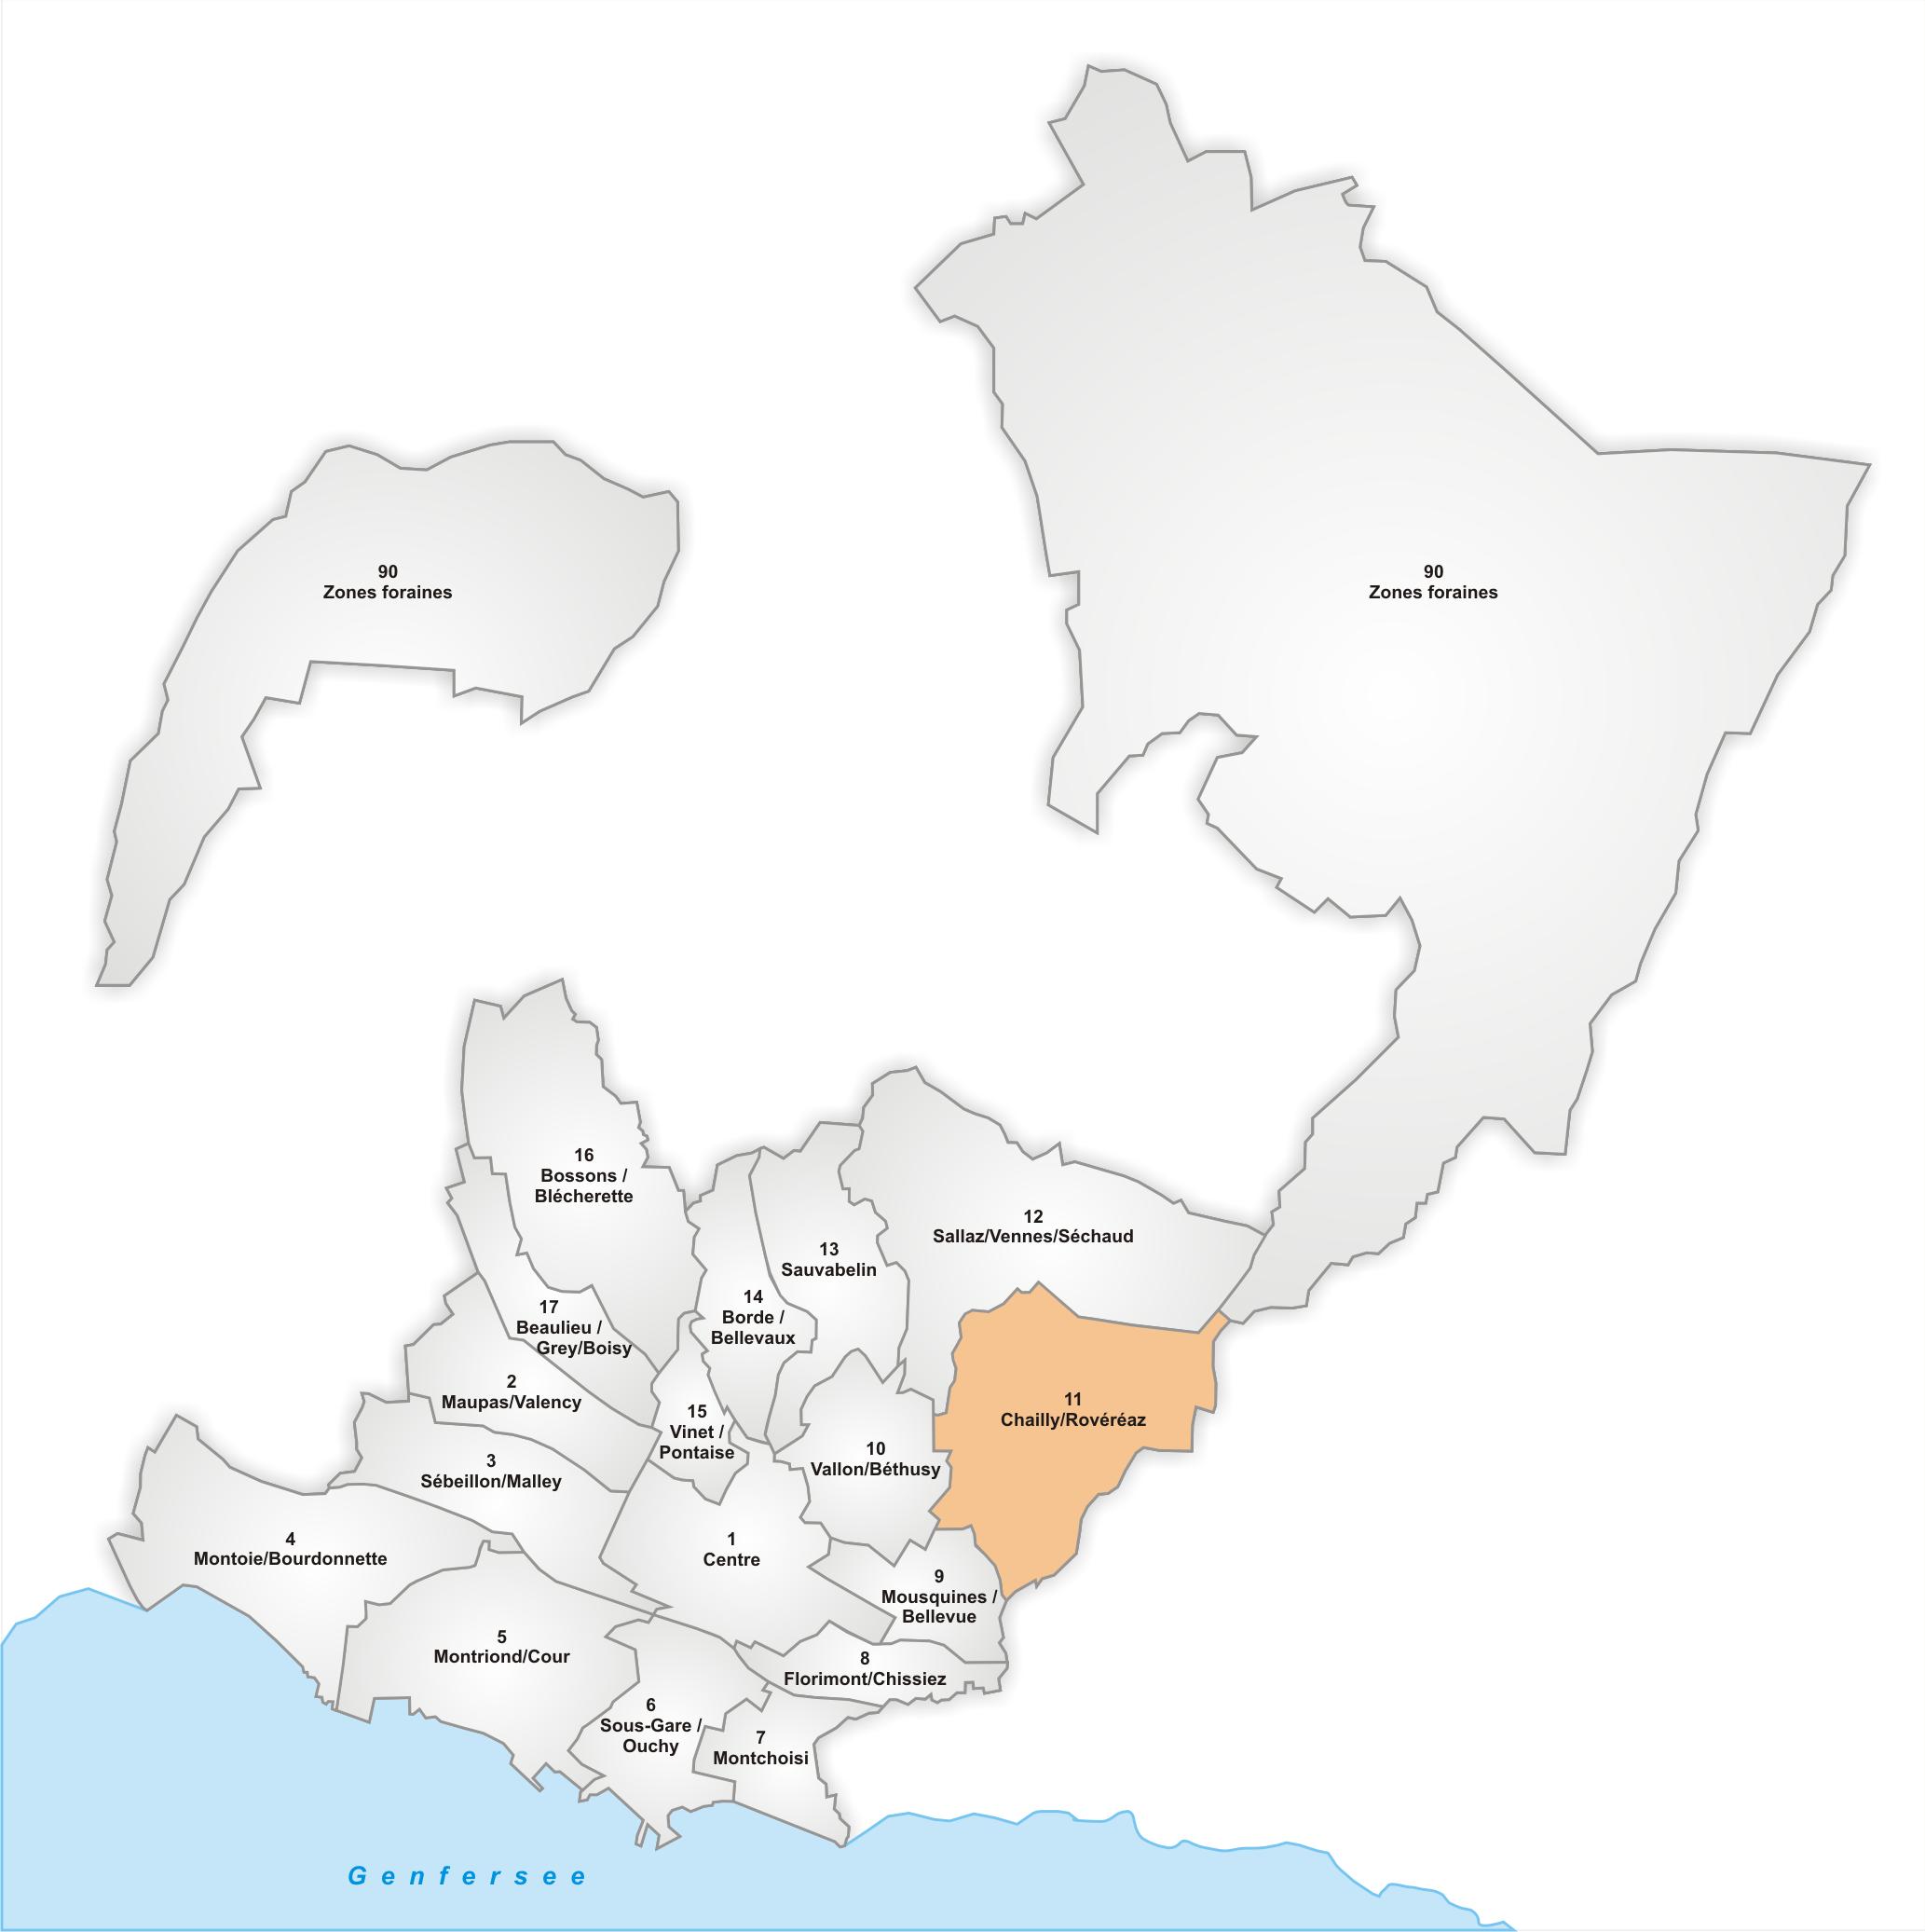 Lage des Stadtteils Chailly/Rovéréaz